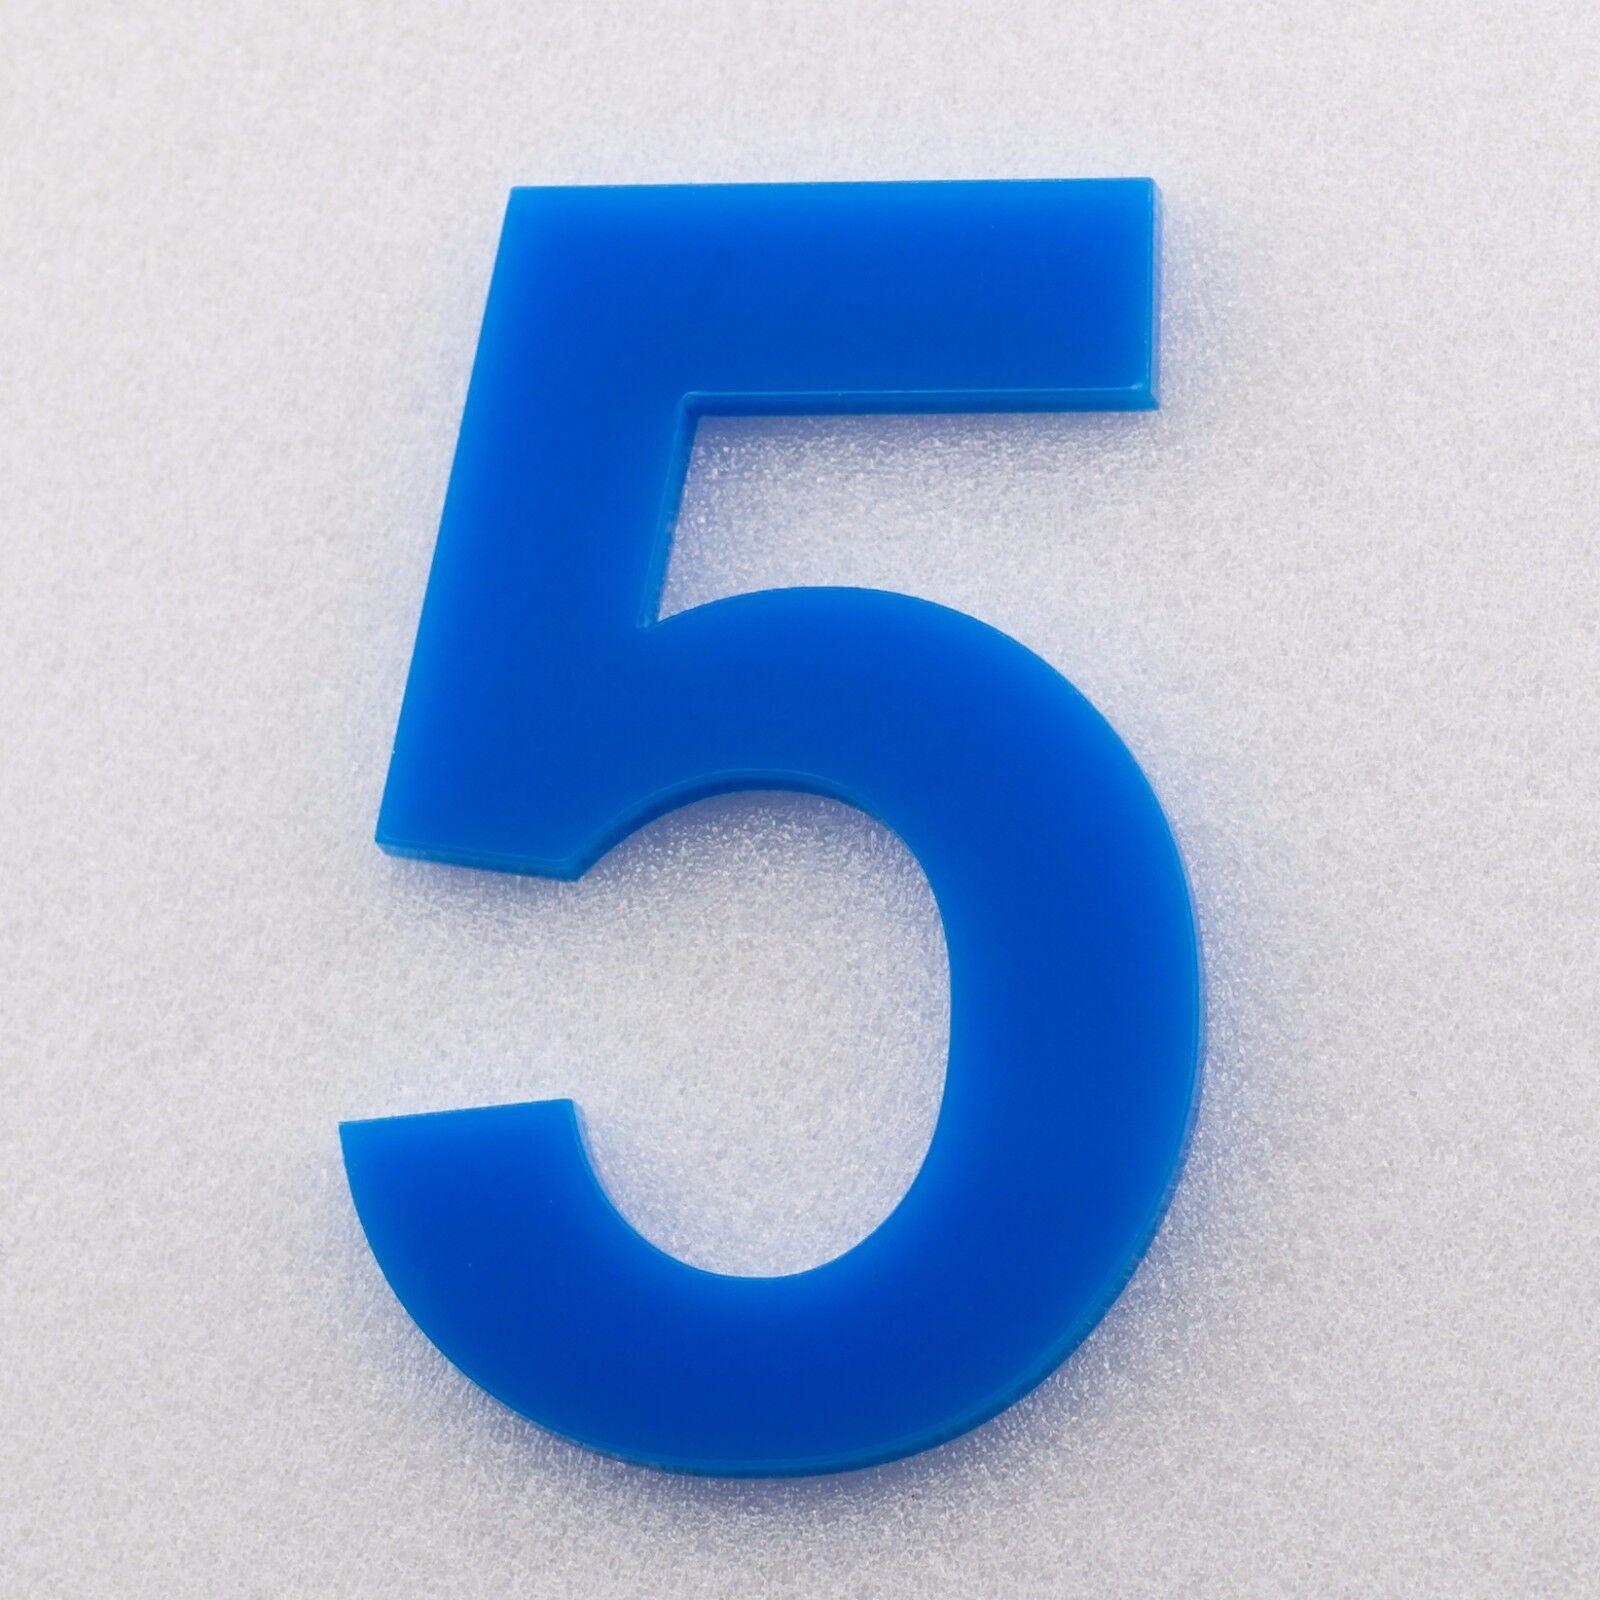 Hausnummer Acryl Hochglanz Himmelblau 5H51 - Türnummer - Nummer - Plexiglas